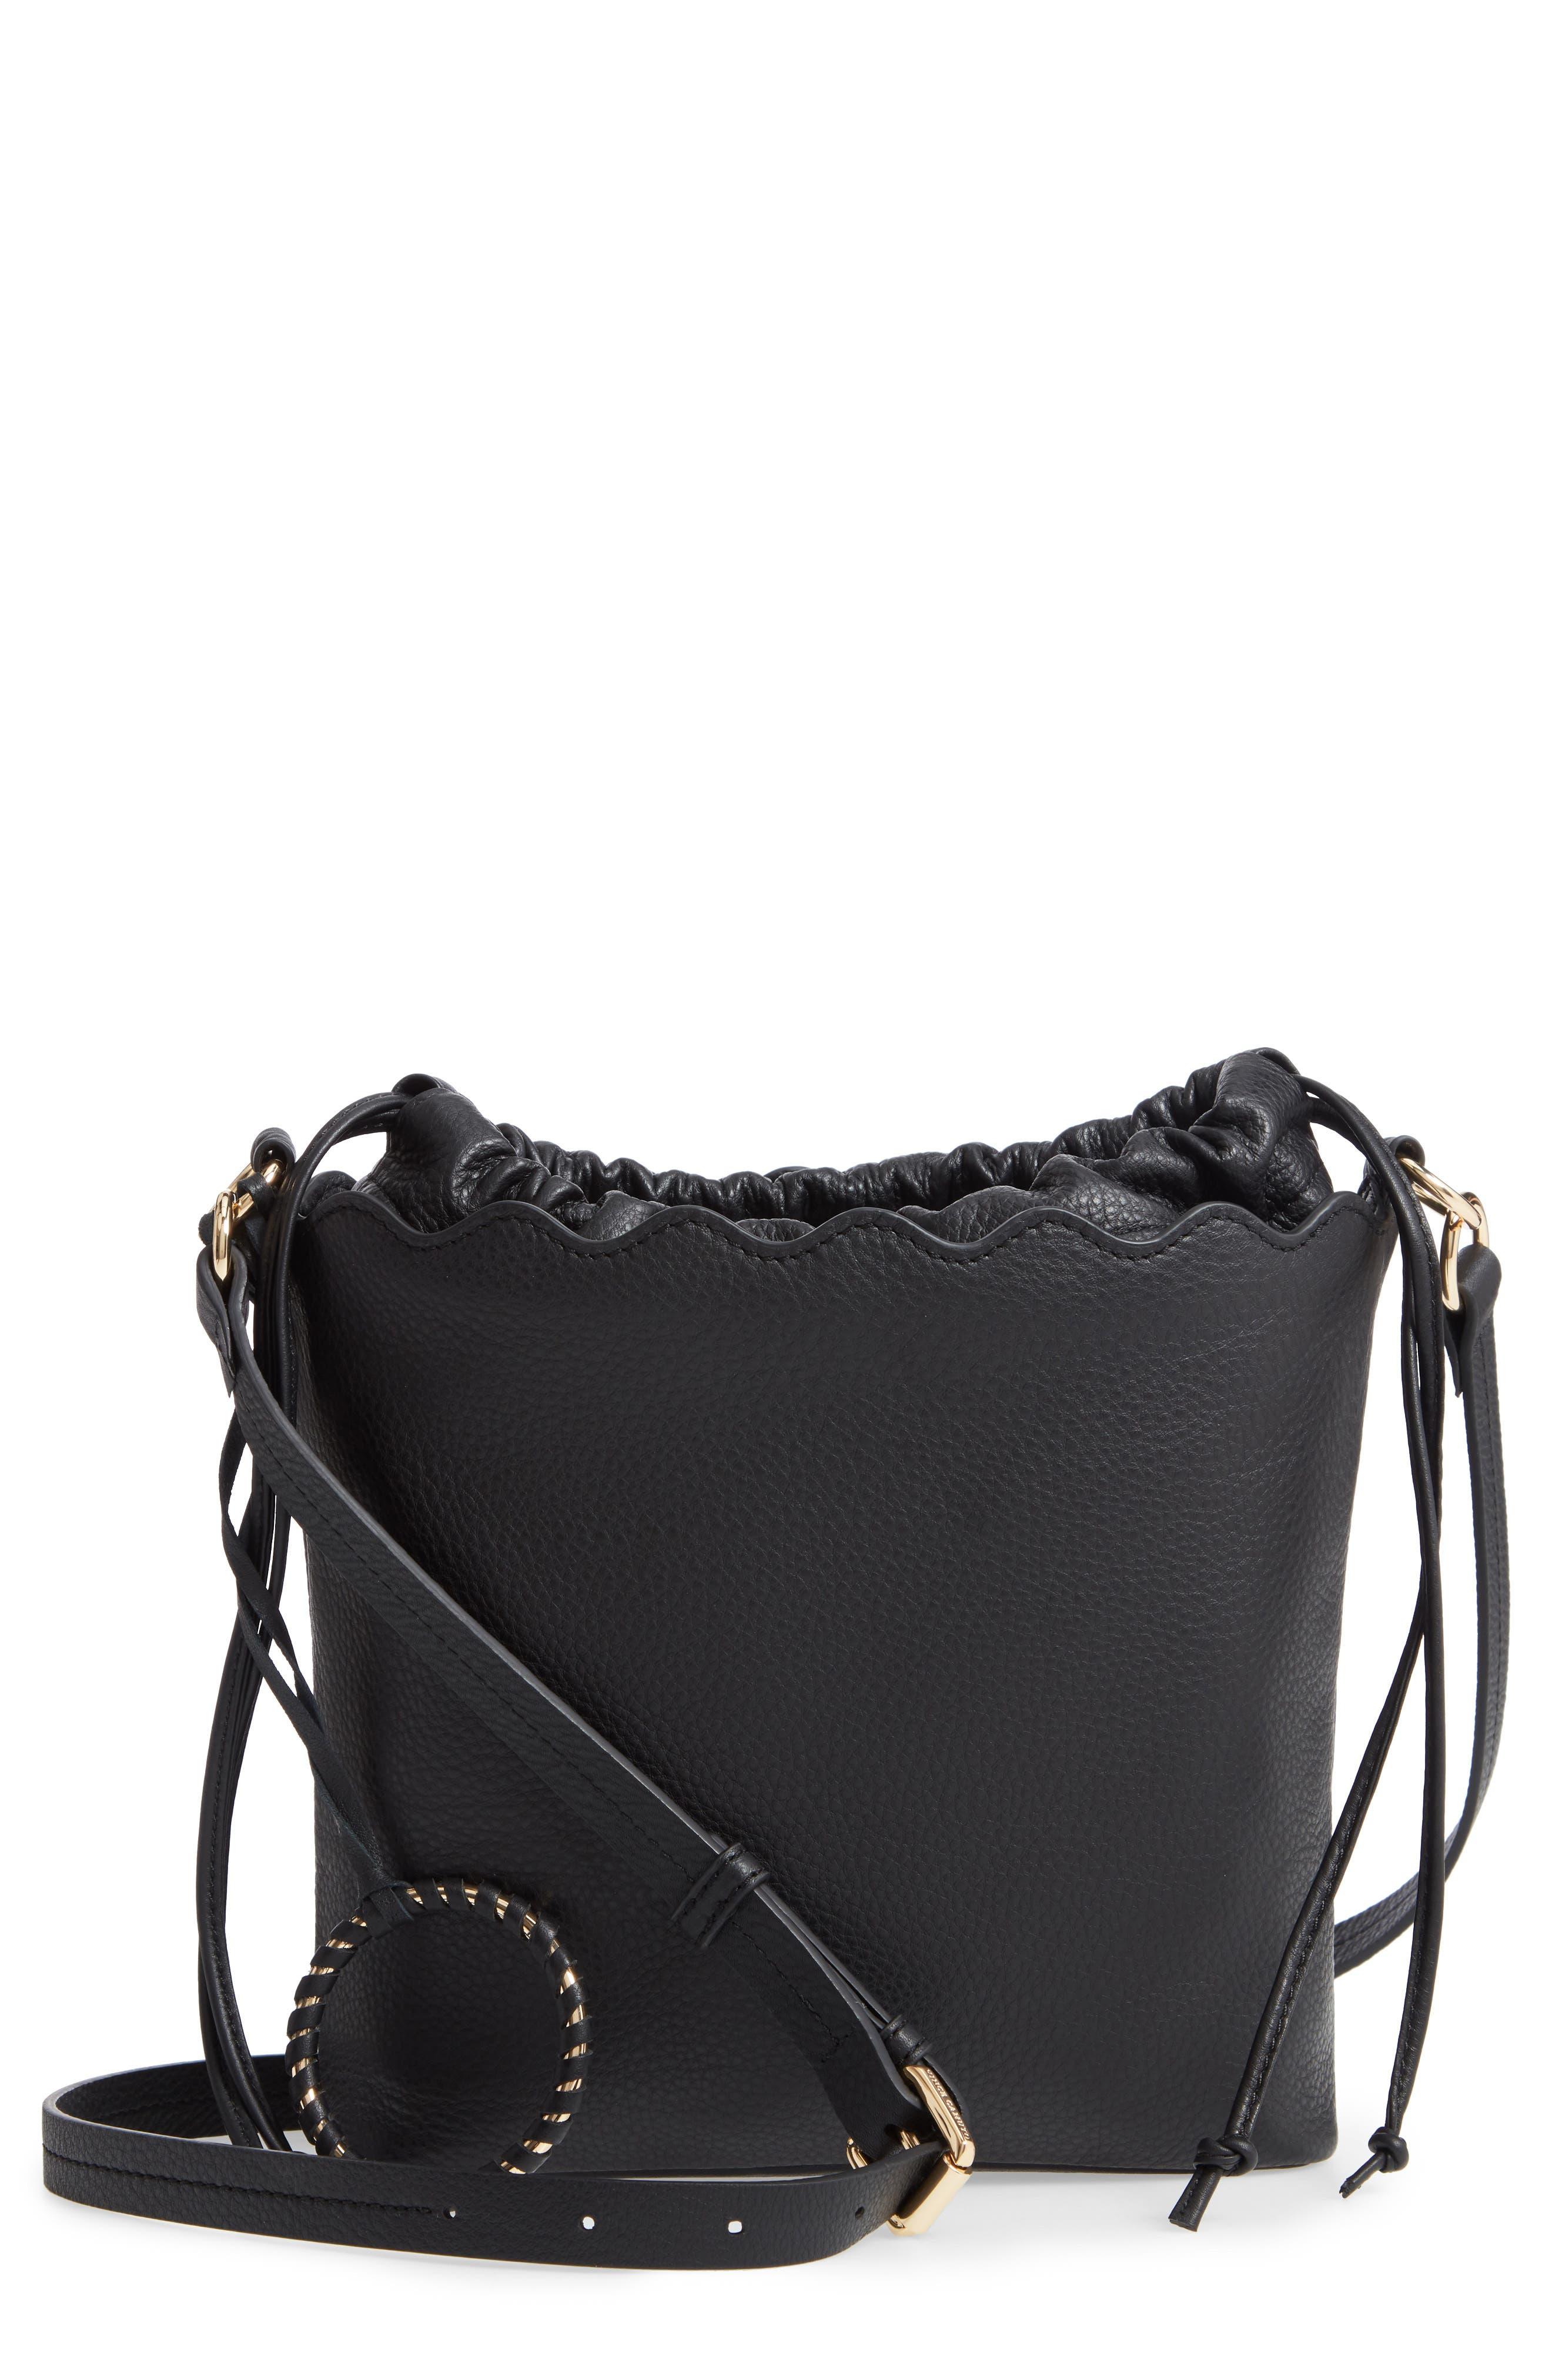 VINCE CAMUTO Wavy Leather Bucket Bag, Main, color, BLACK